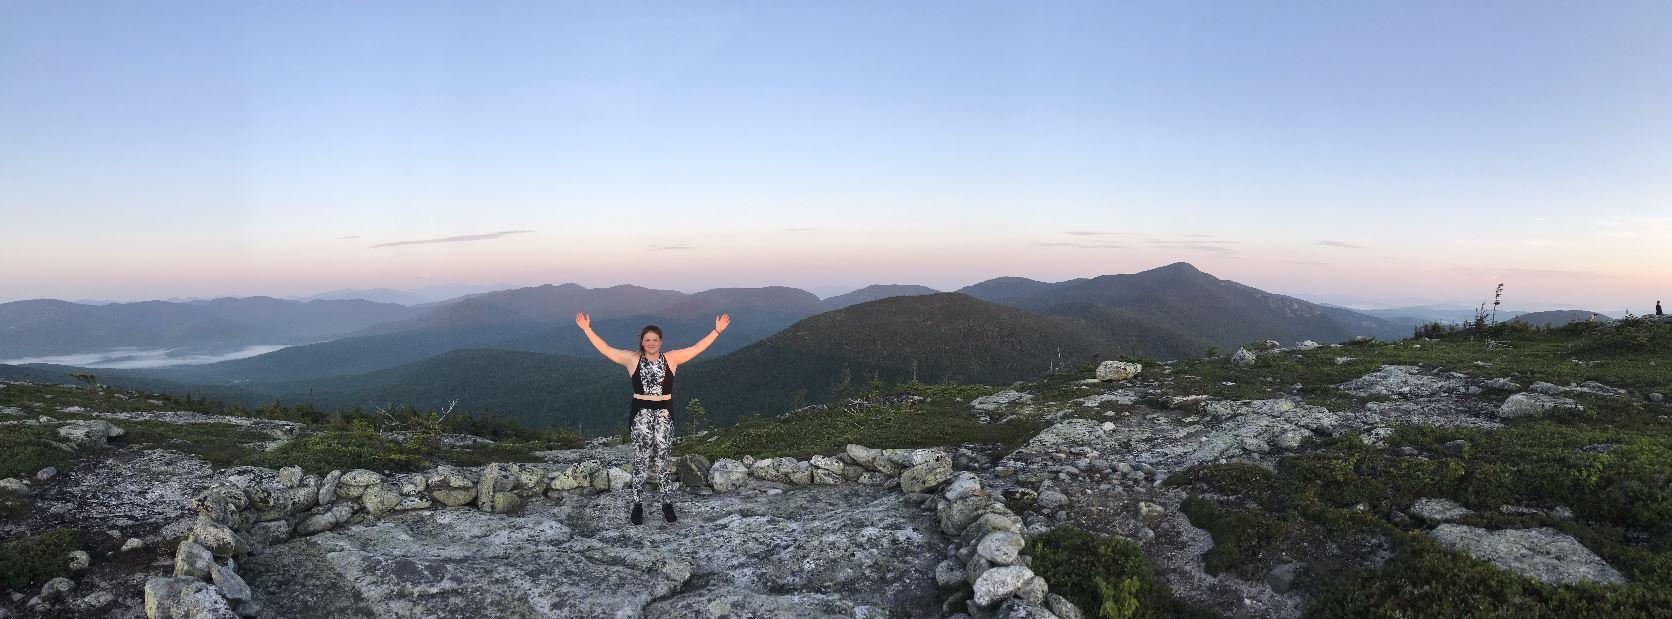 Student Celebrating a hike.